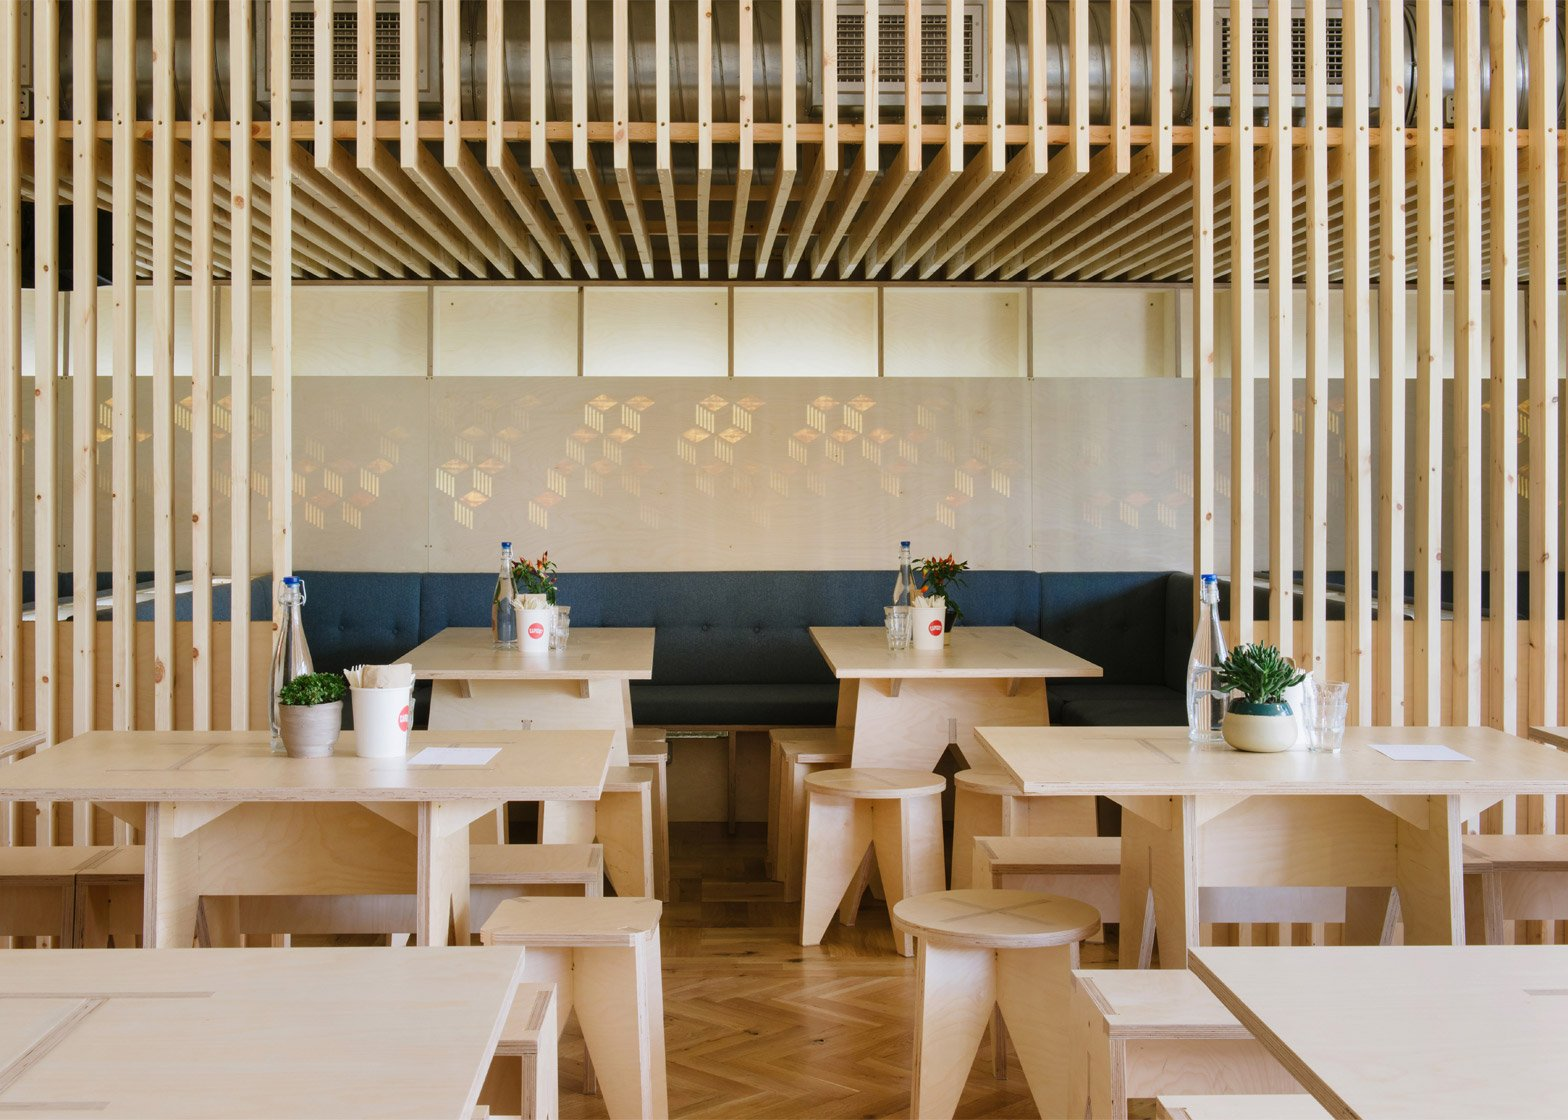 Fleet Architects design Mason and Company's new Hackney Wick bar, Here East